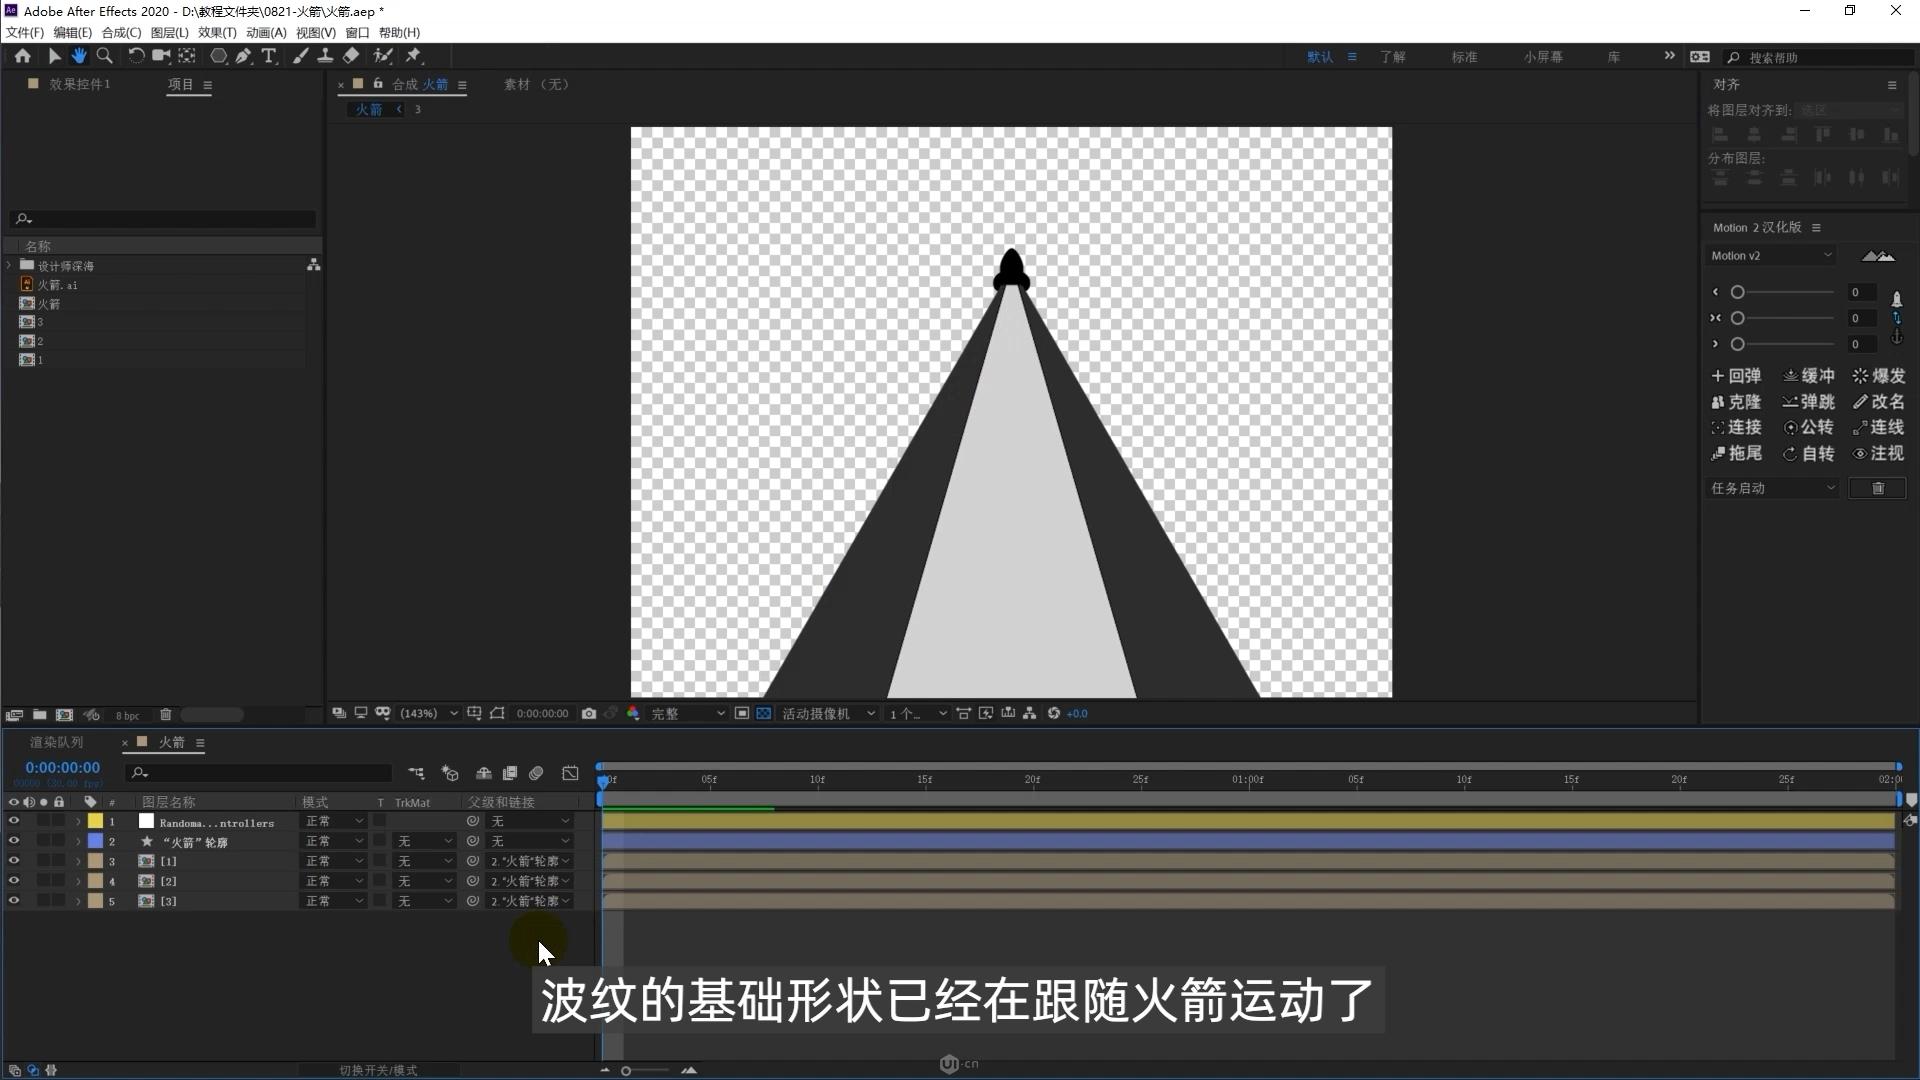 AE如何制作简单的太空旅行MG动画(7)